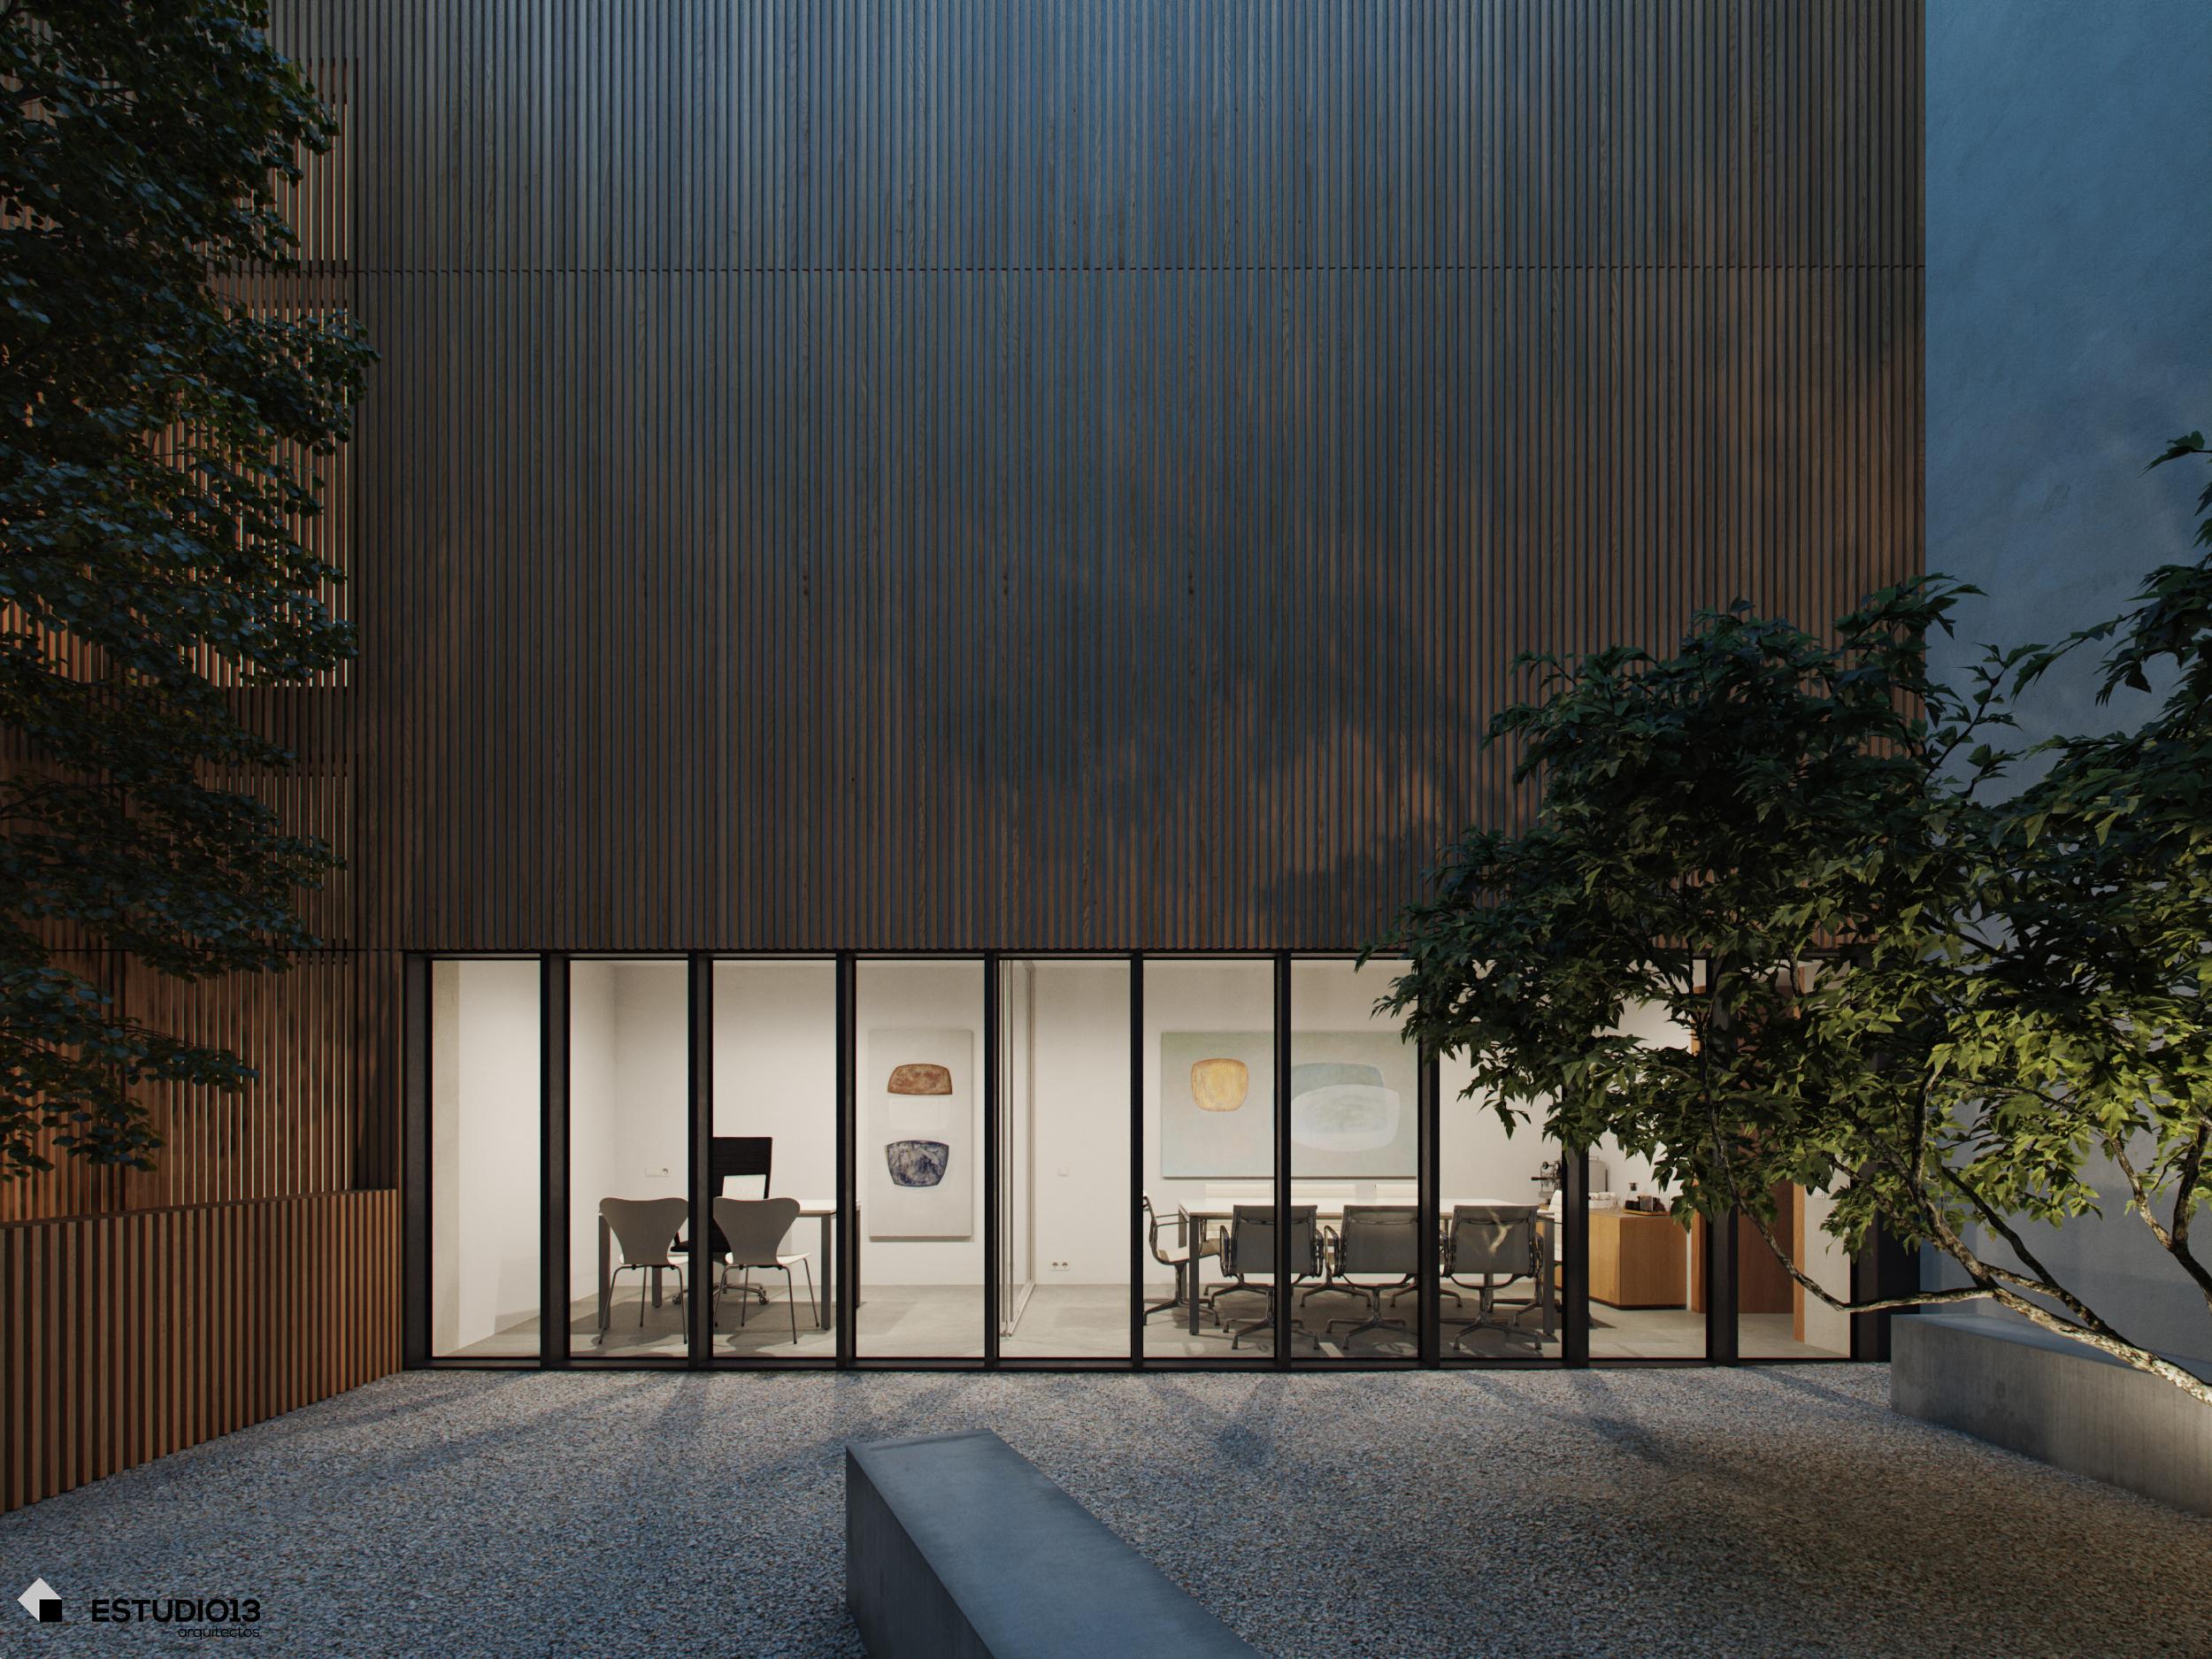 estudio13arquitectos_museo_fundacion_jjcc_plaza_autor_5